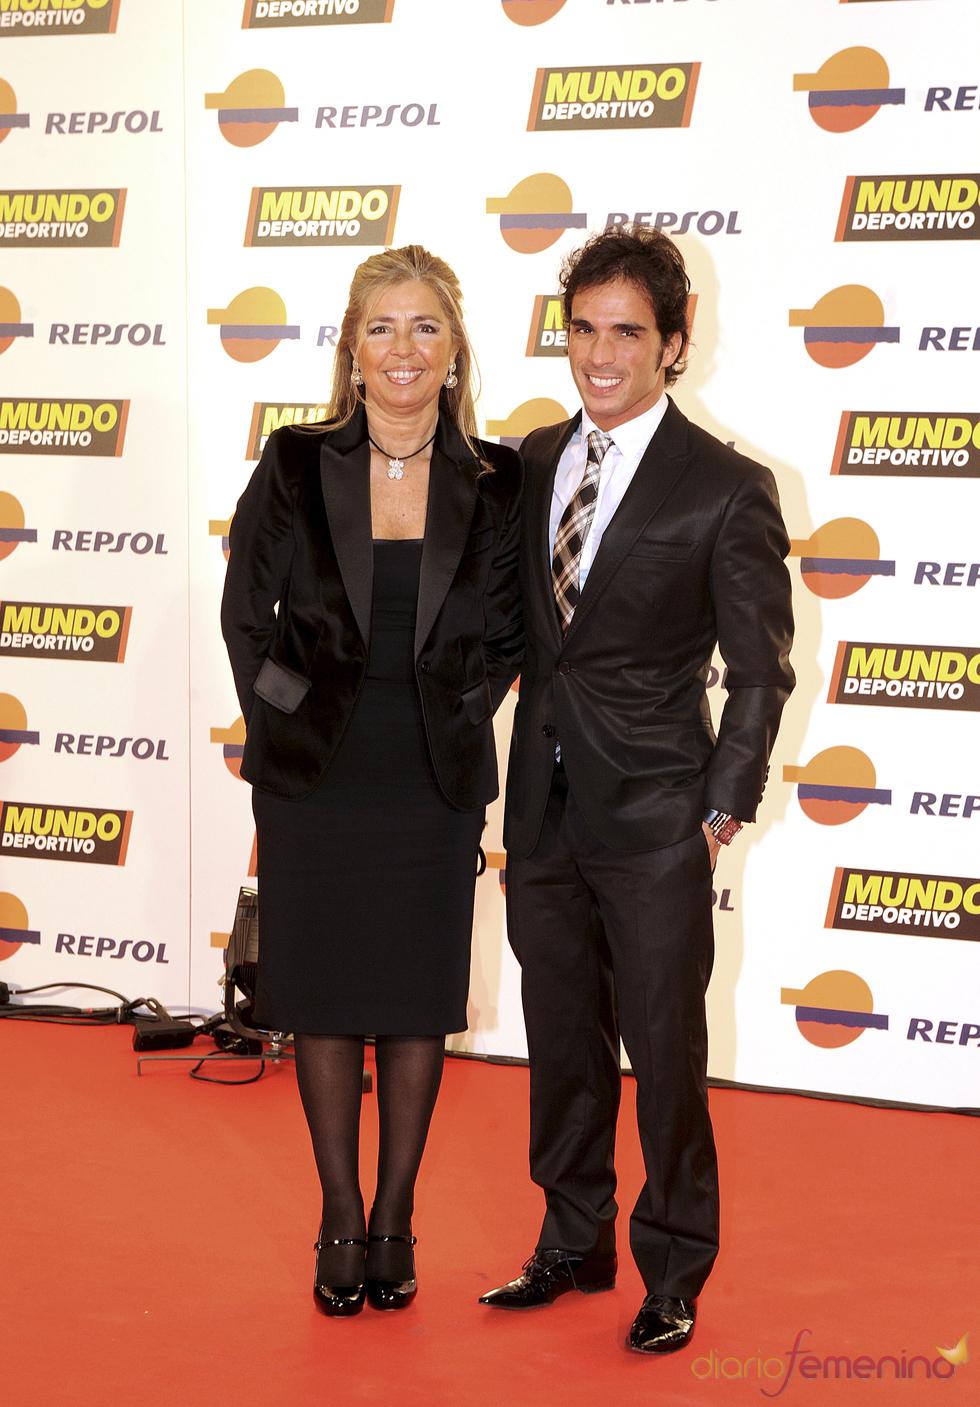 Toni Elías en la gala 'Mundo Deportivo' 2011